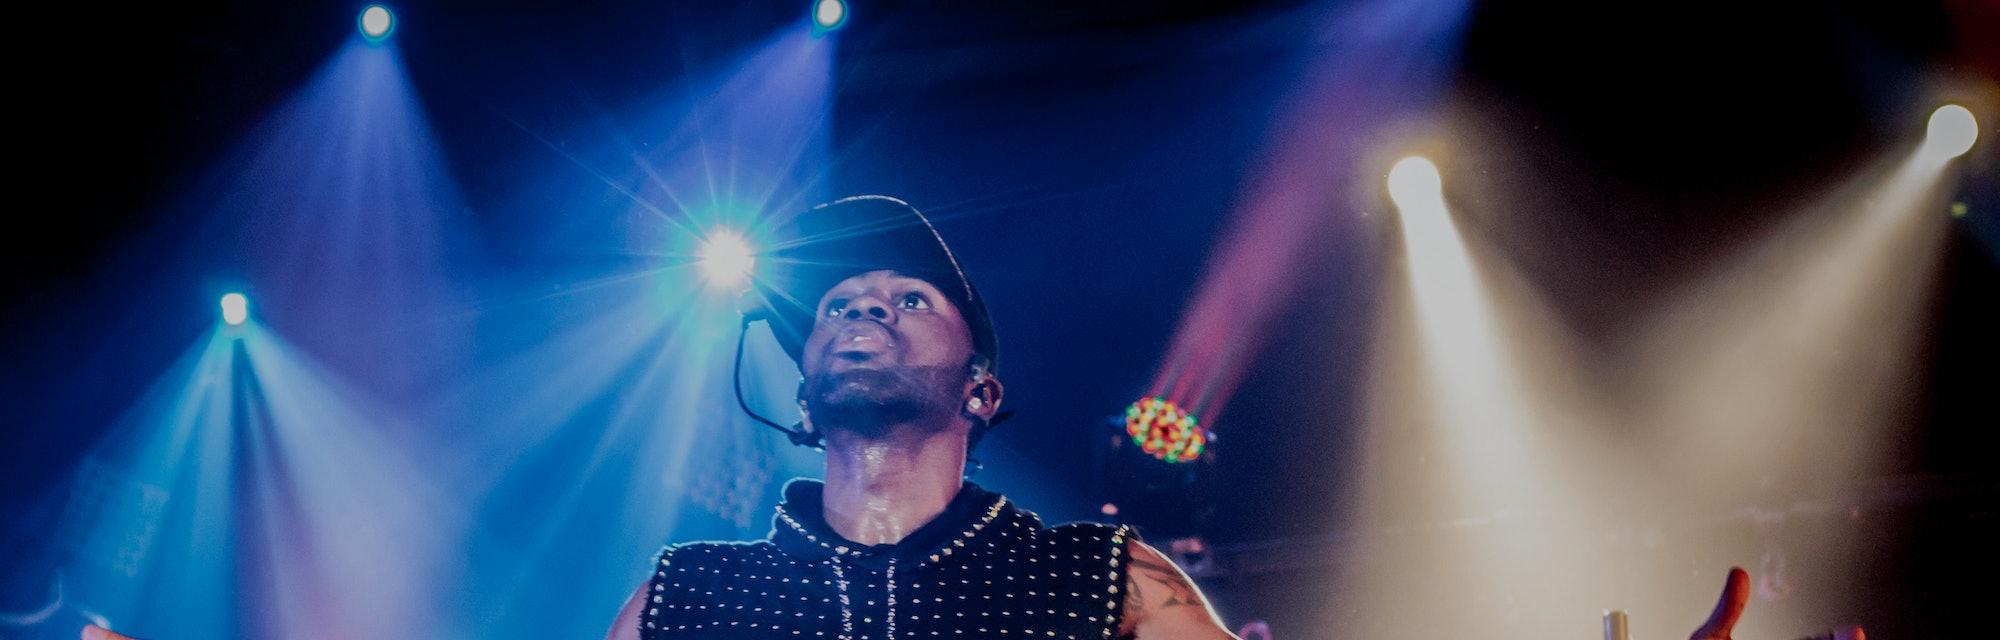 Jason Derulo performing at a concert.